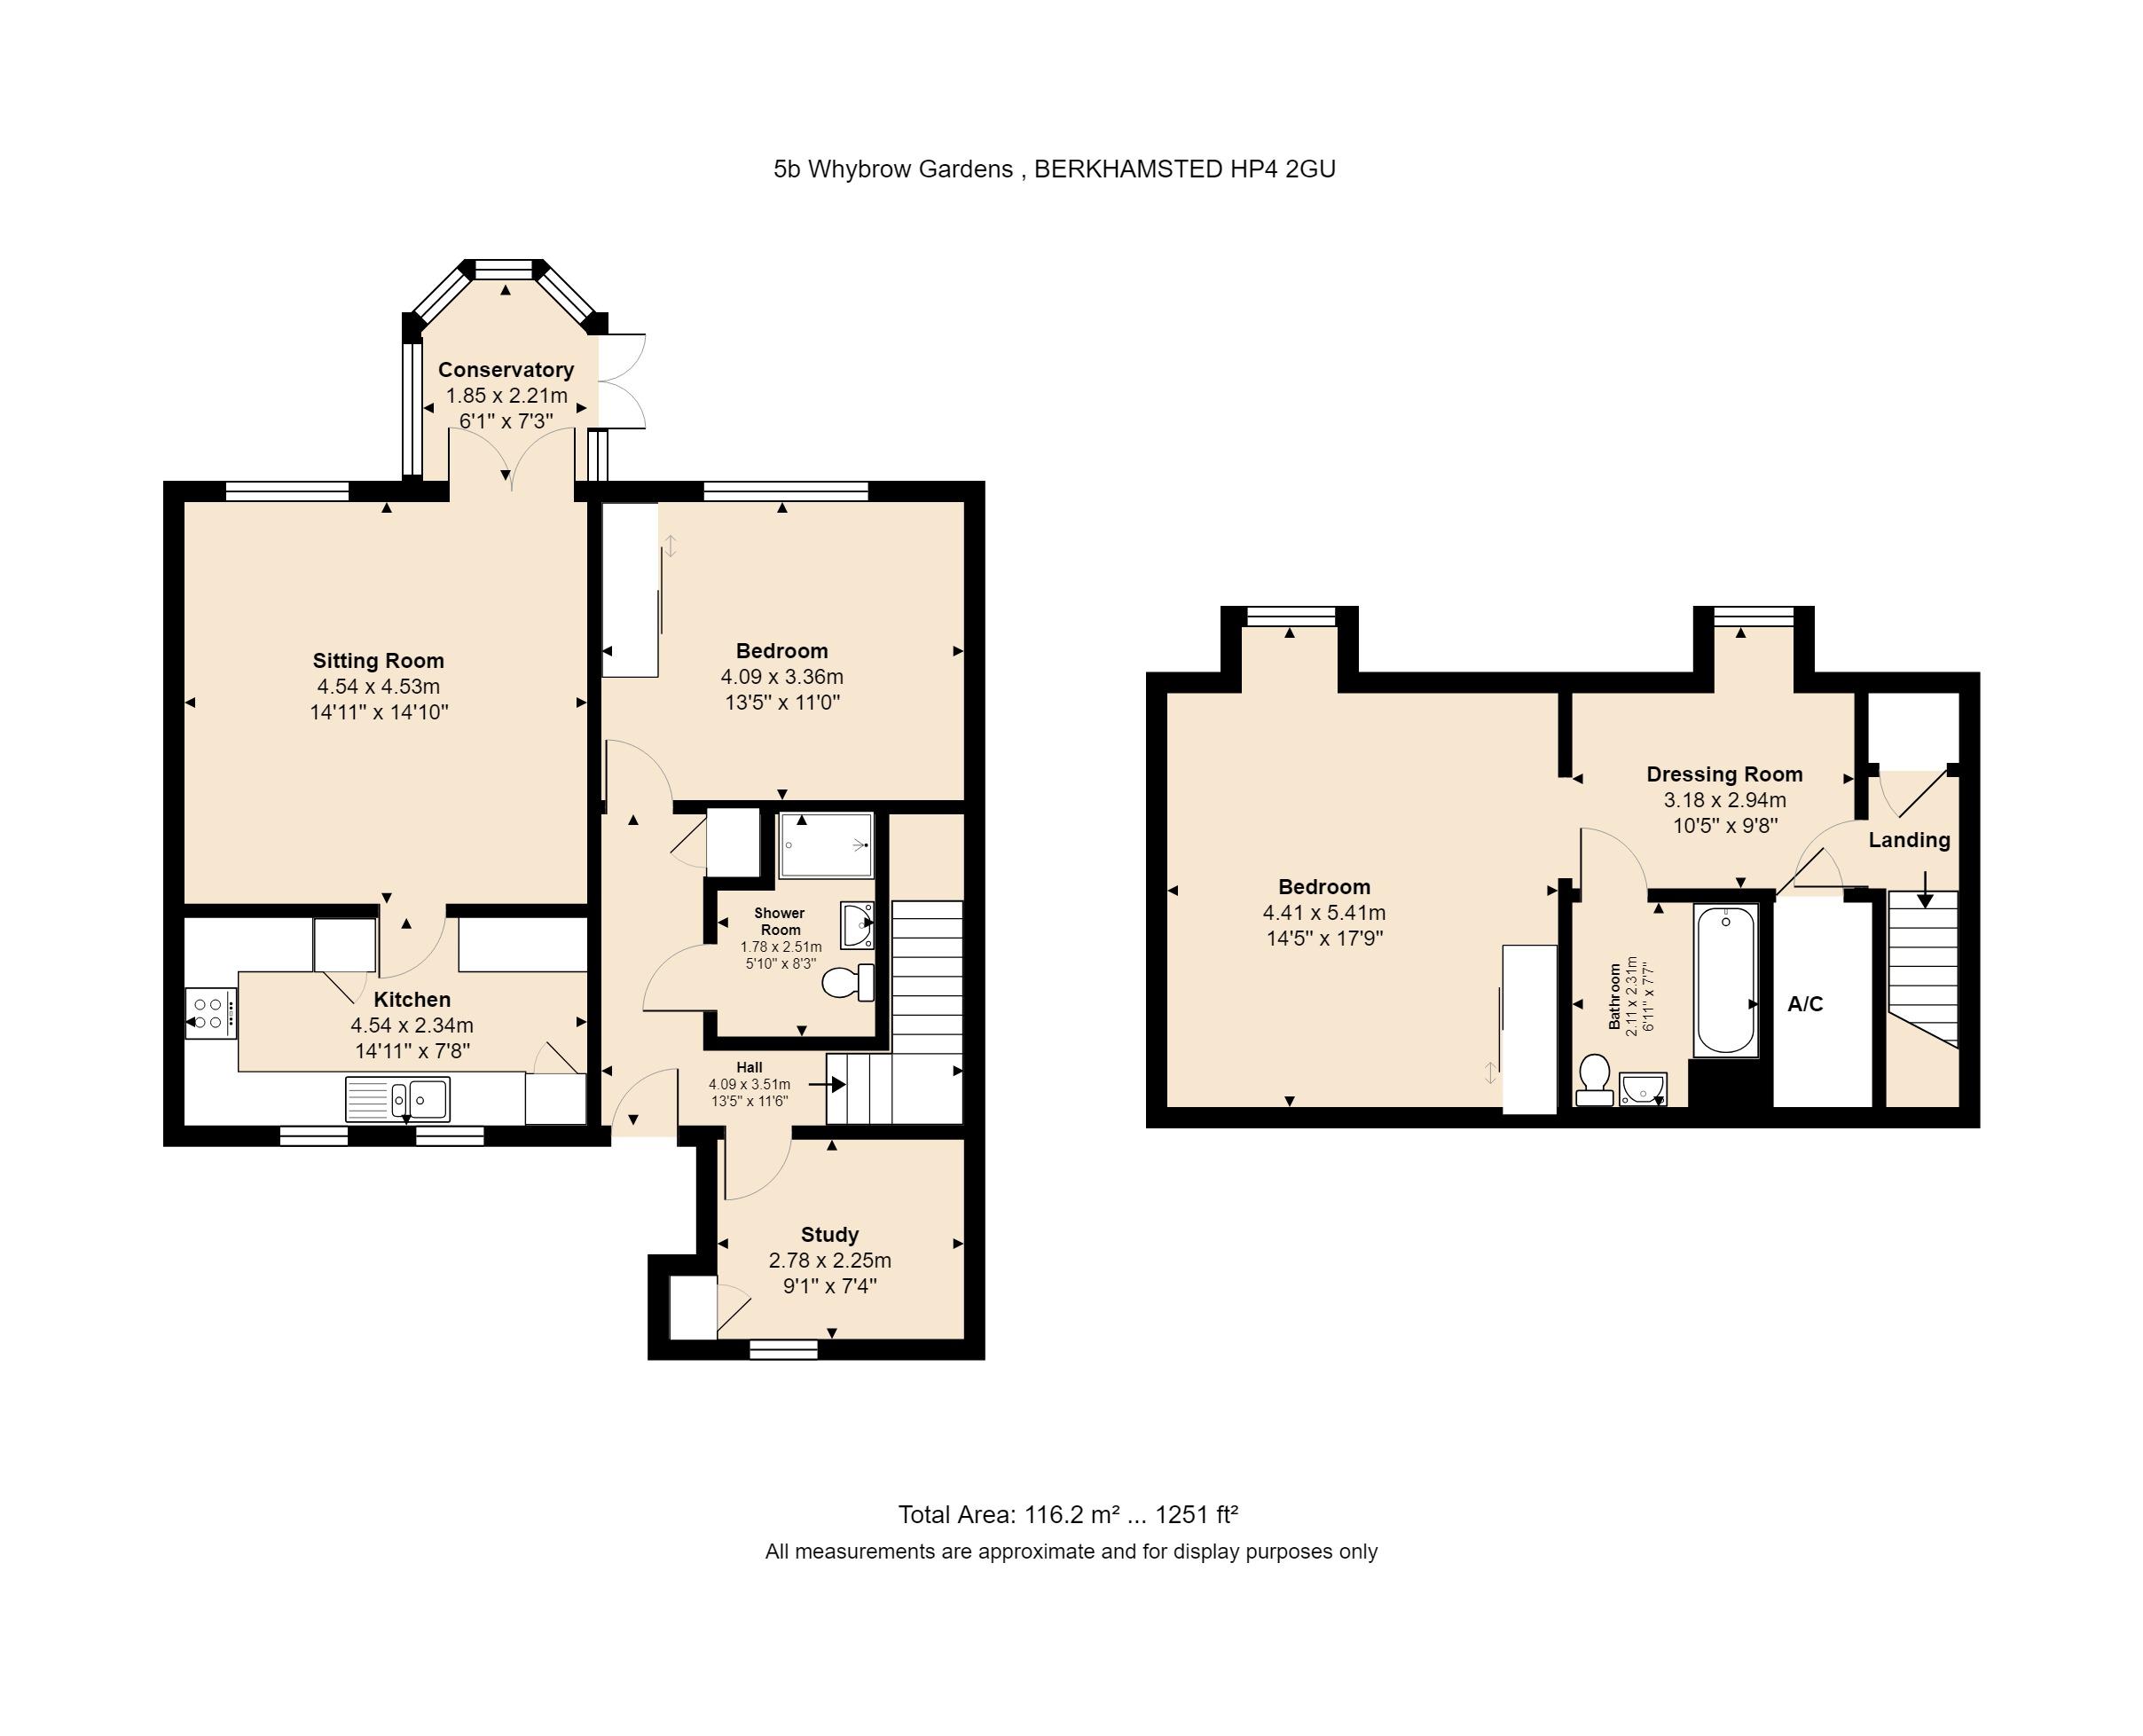 5b Whybrow Gardens Floorplan